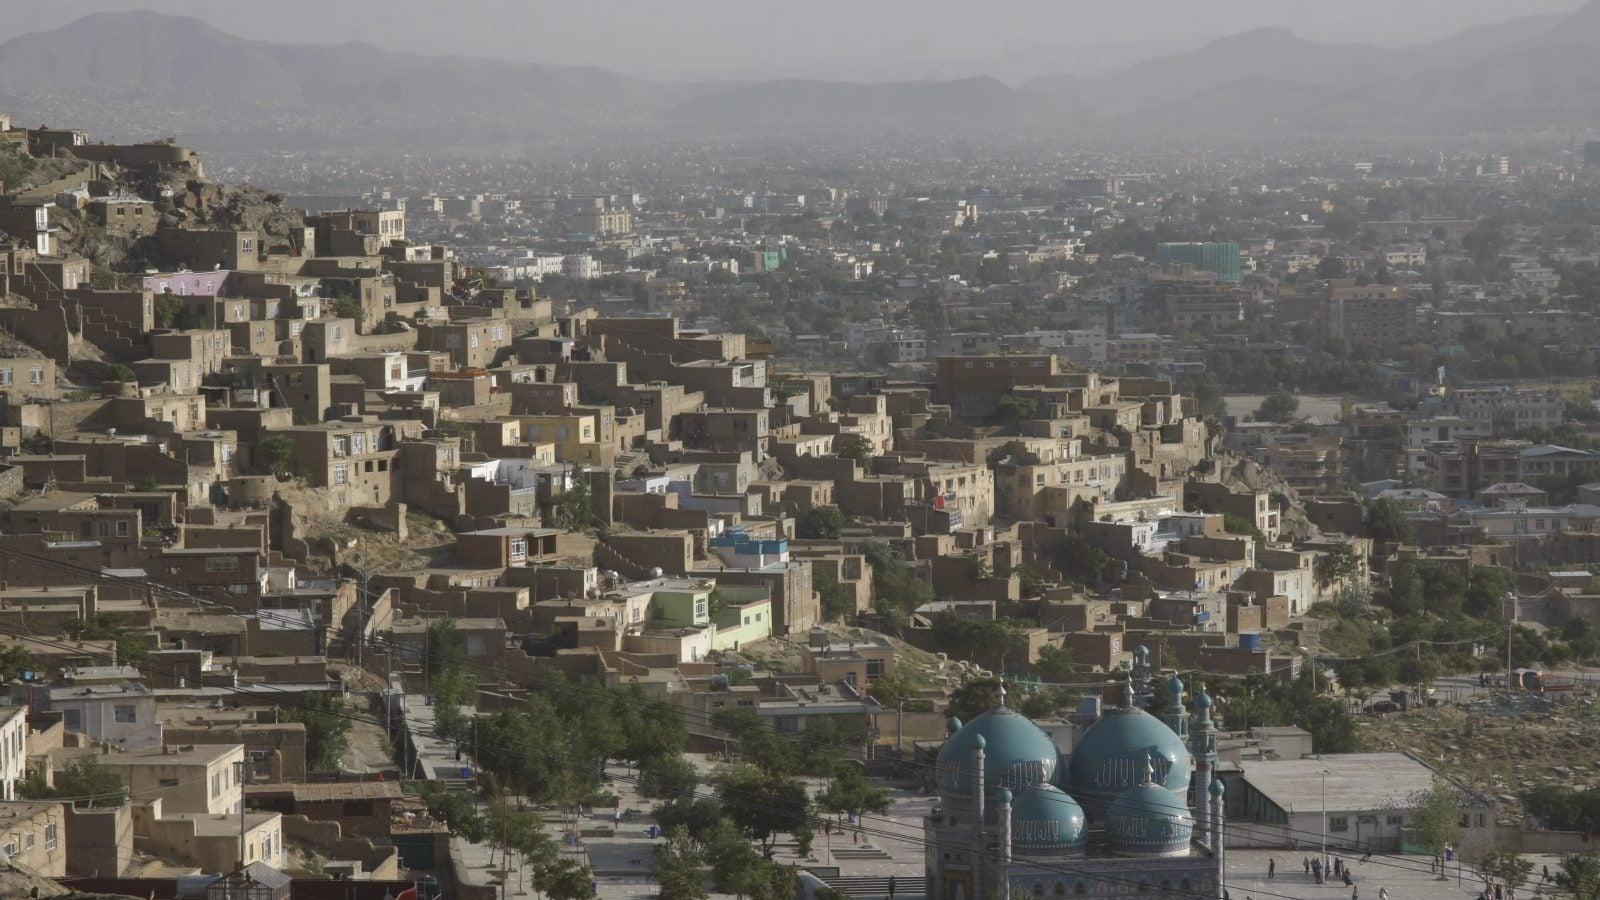 Aerial view of Kabul, Afghanistan